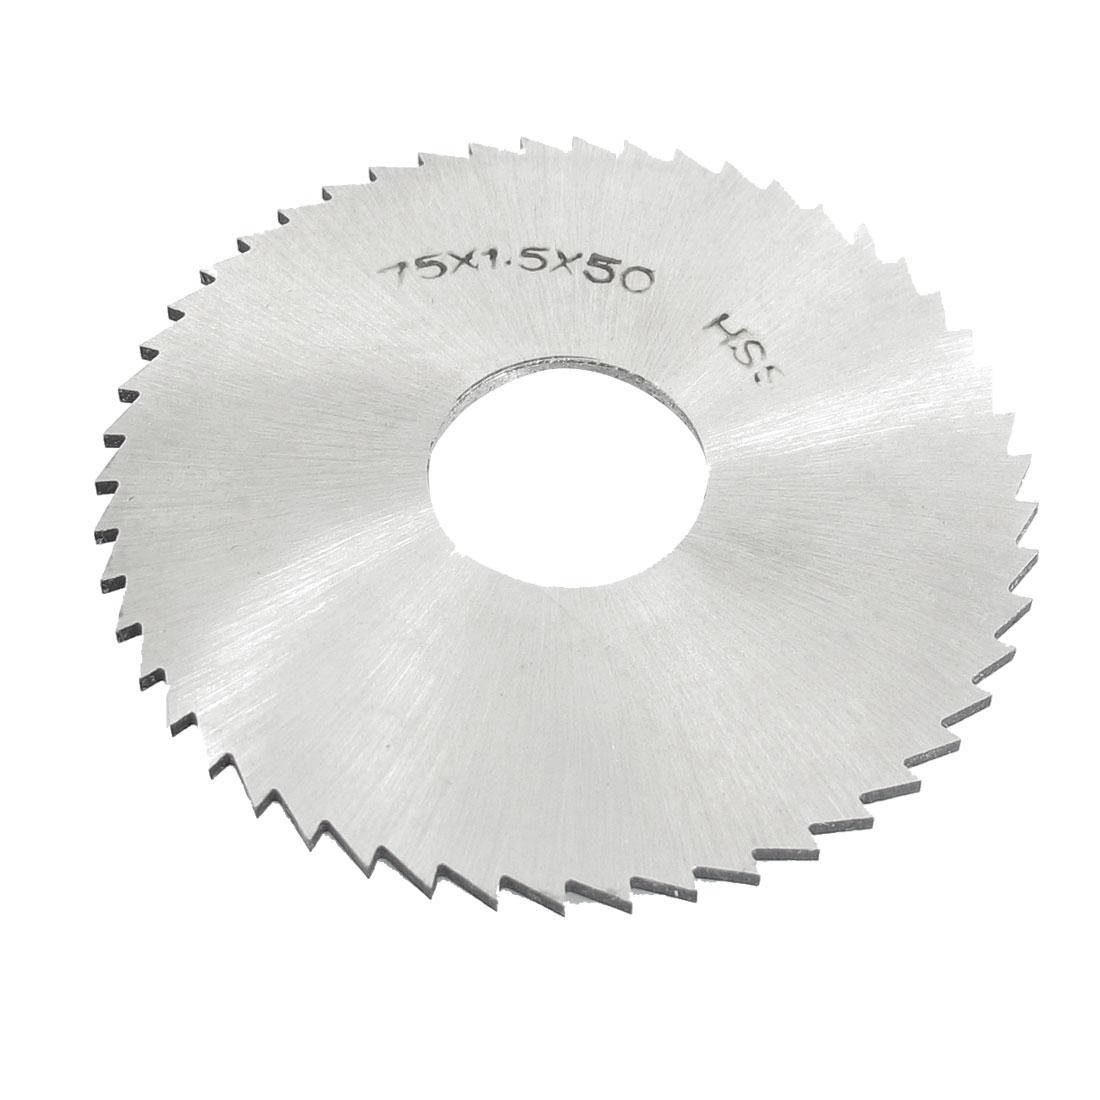 22mm Arbor Hole Dia 1.5mm Thick 50 Teeth HSS Slotting Saw